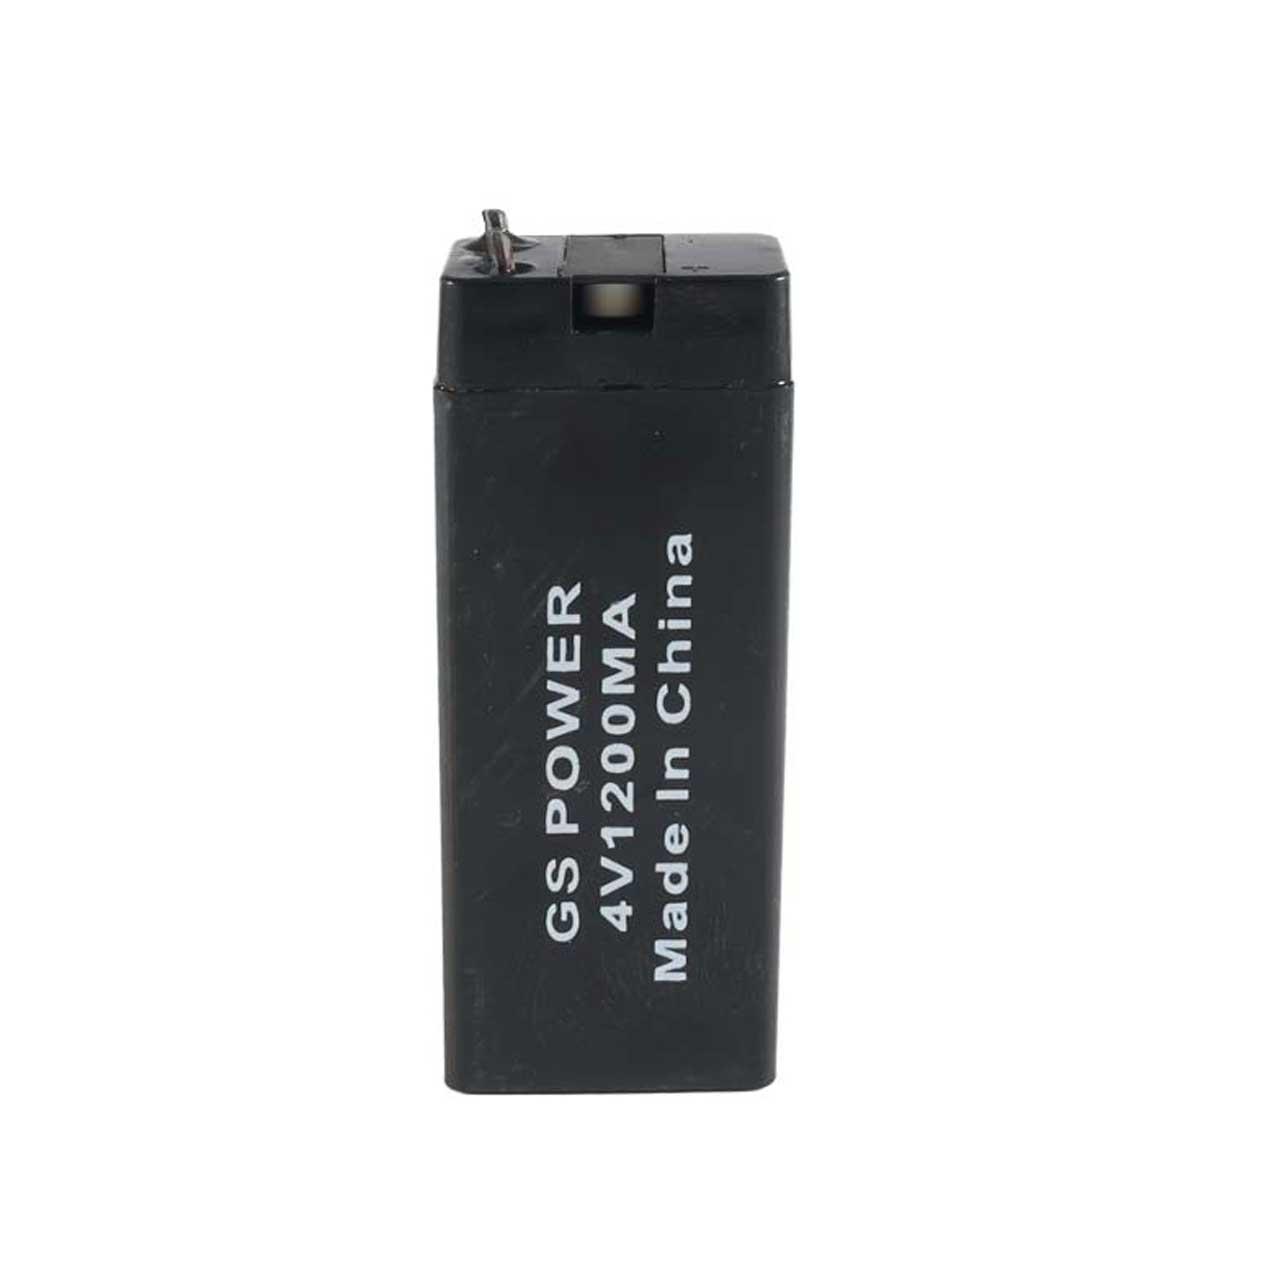 باتری یو پی اس 4 ولت 1.2 آمپر ساعت جی اس پاور مدل GS4V1200